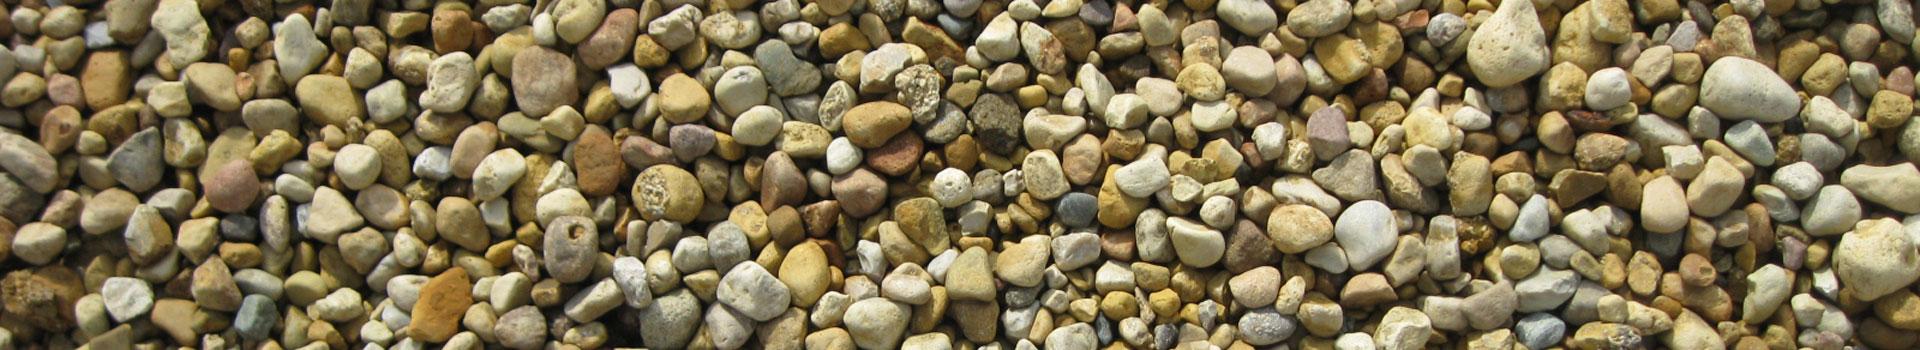 Construction Material (Gravel/Sand)